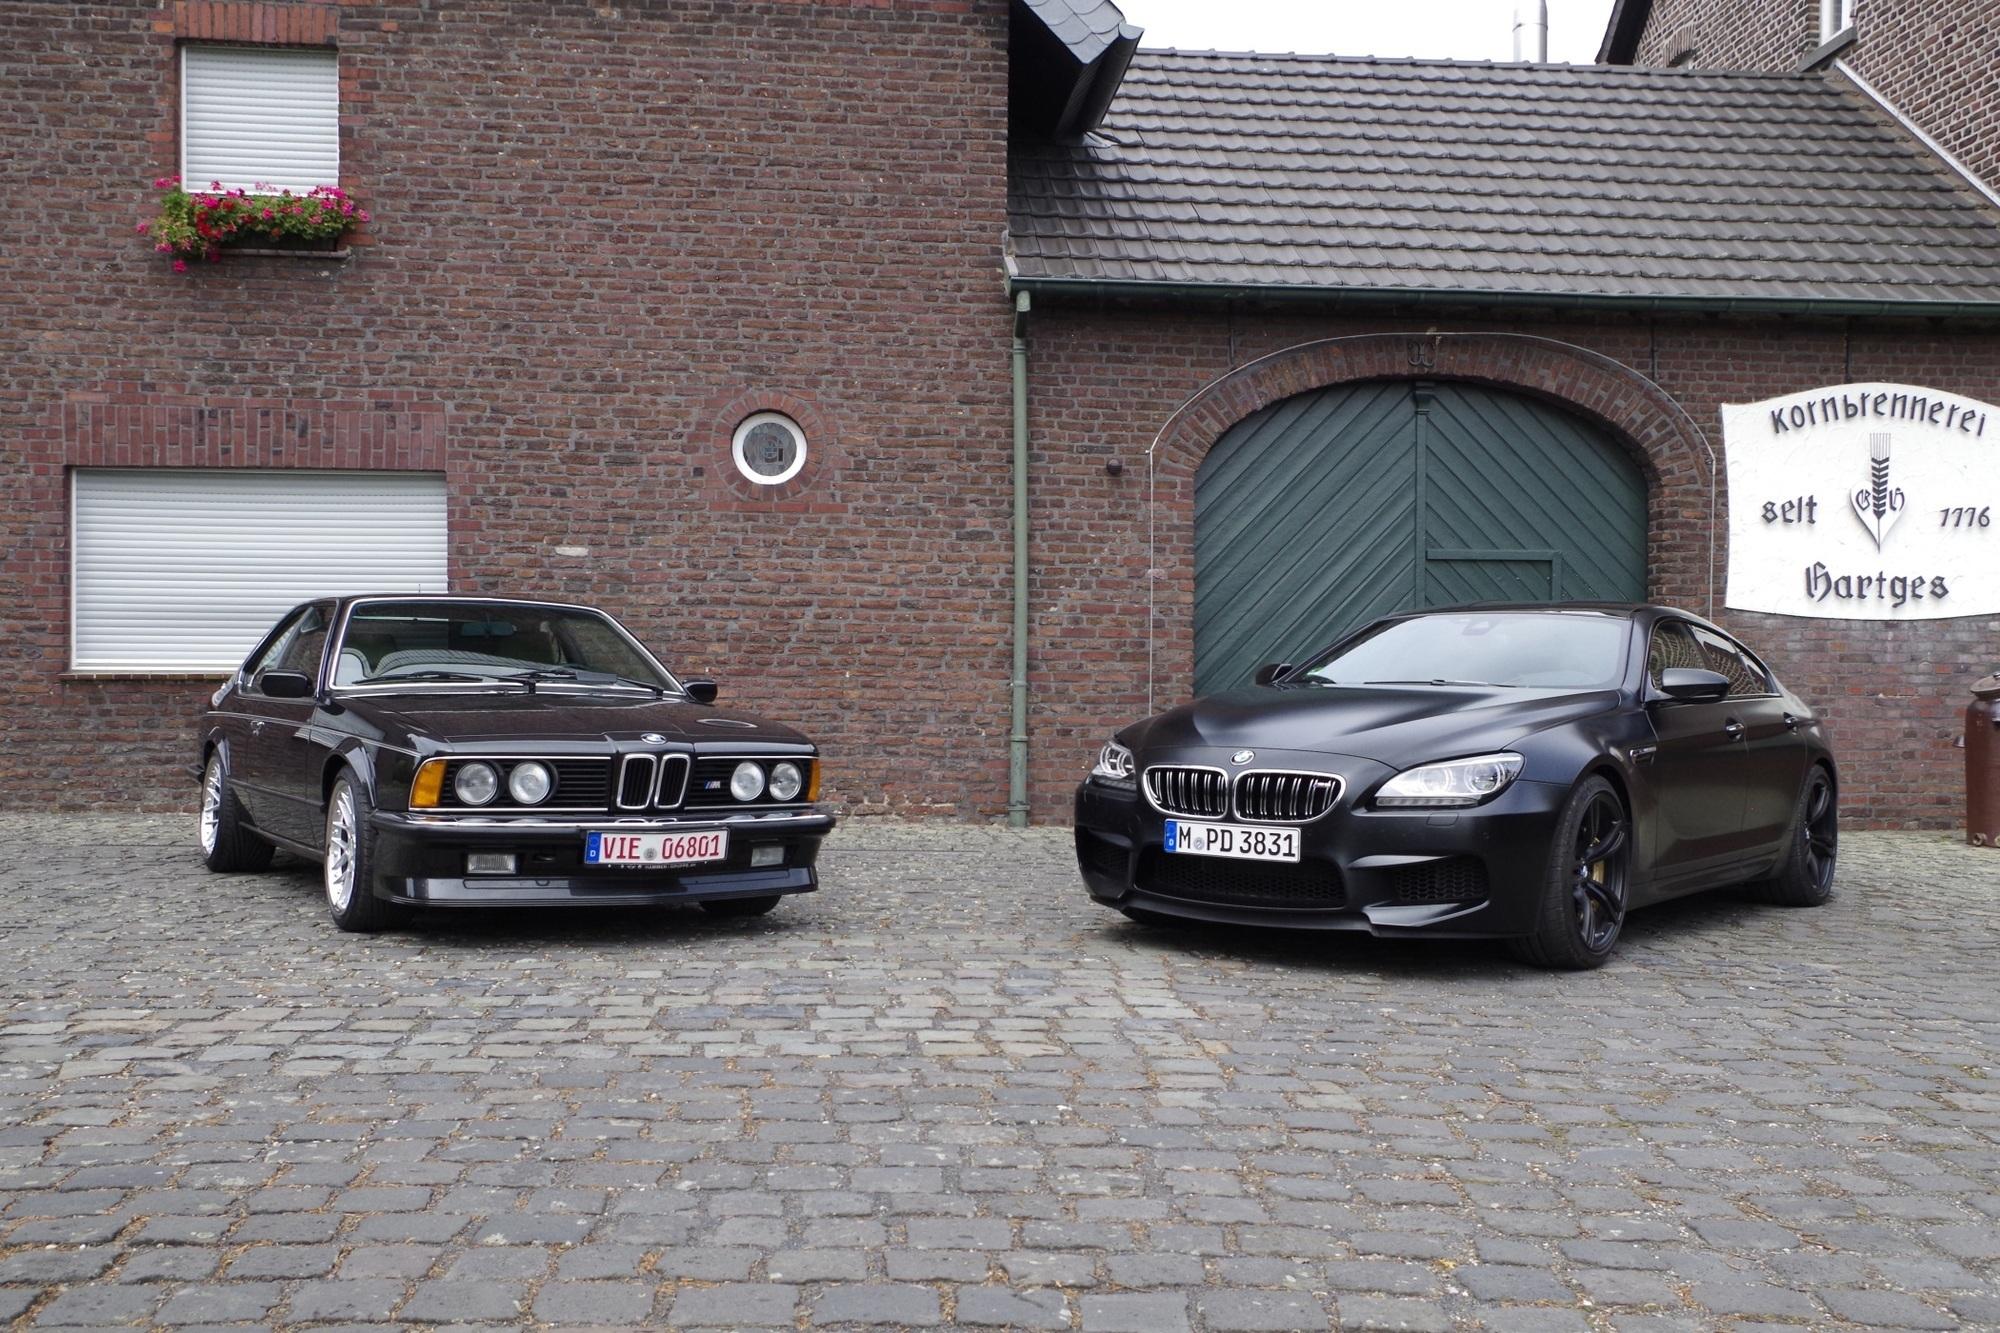 Youngtimer im Test: Impression BMW M635 CSi und M6 Gran Coupé - Zwei Schwarze M